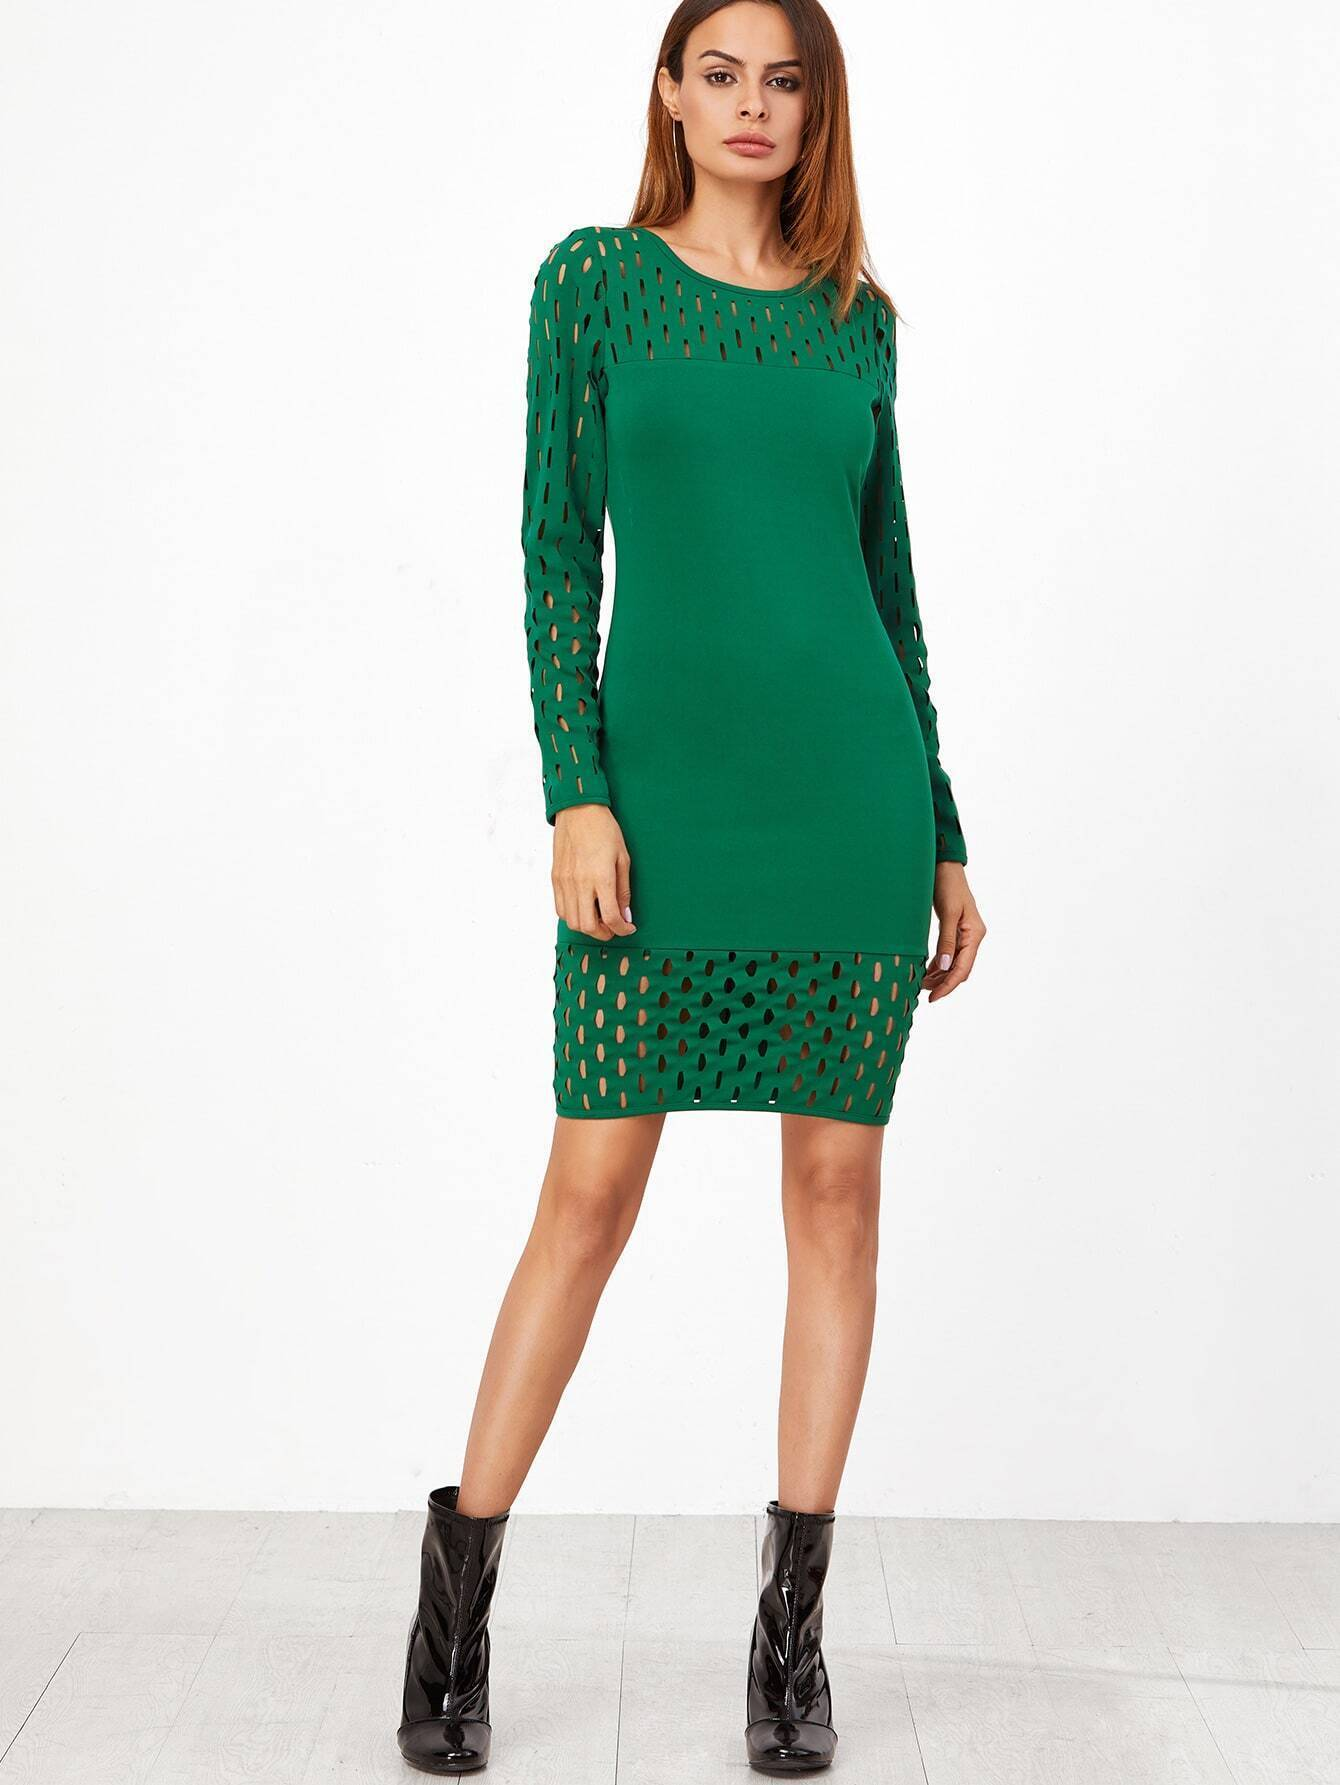 Green Hollow Out Long Sleeve Sheath Dress